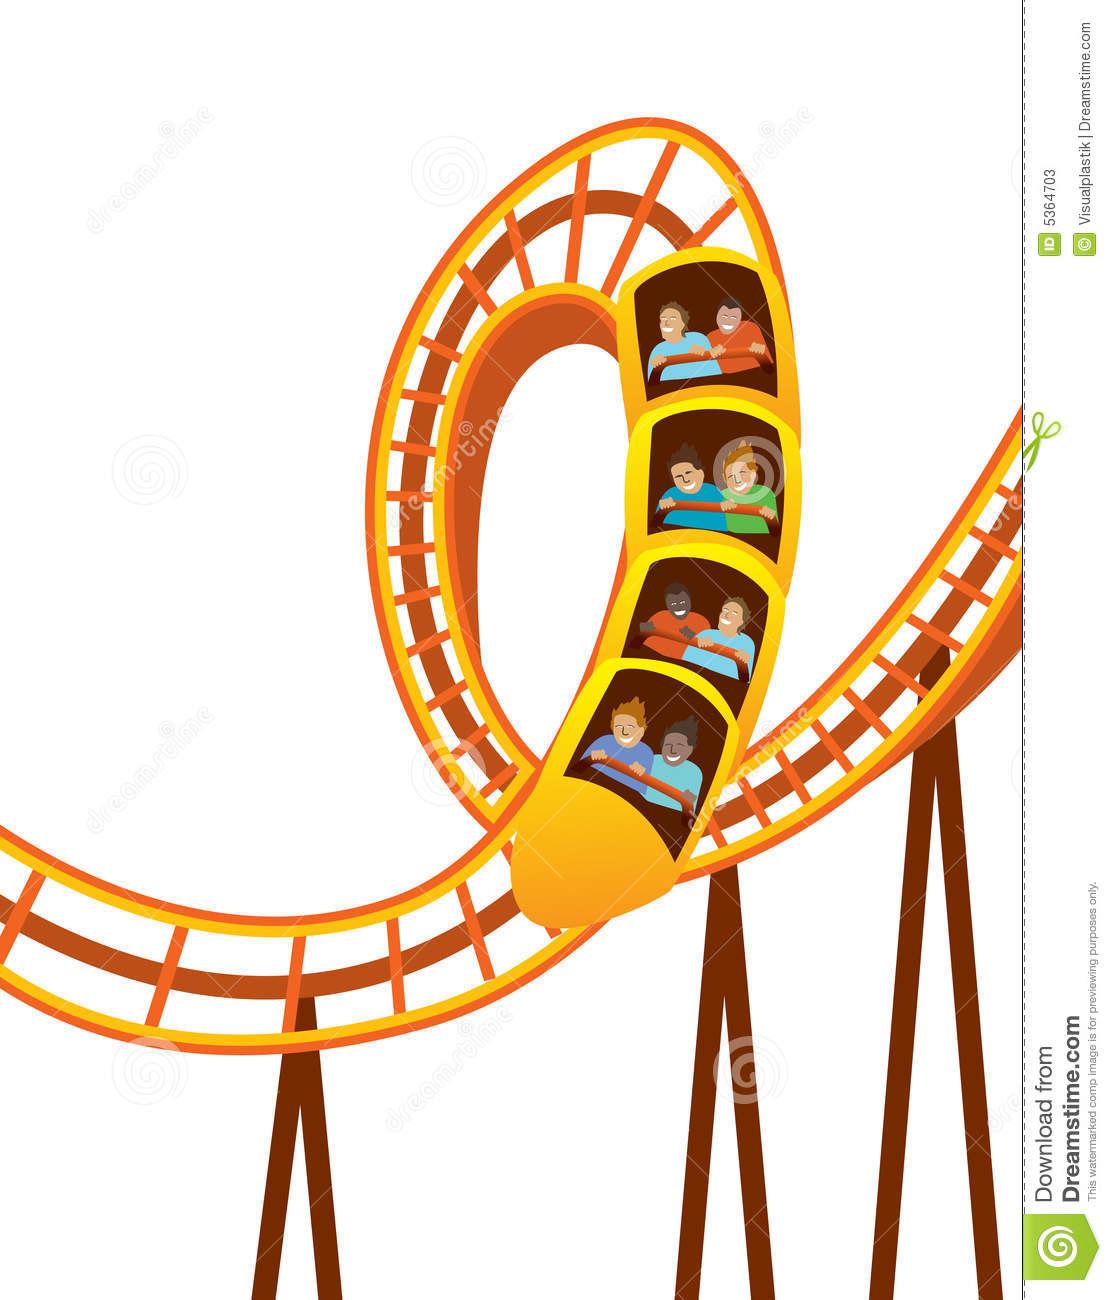 Clip Art Roller Coaster Clip Art roller coaster clipart kids clipartfox roller